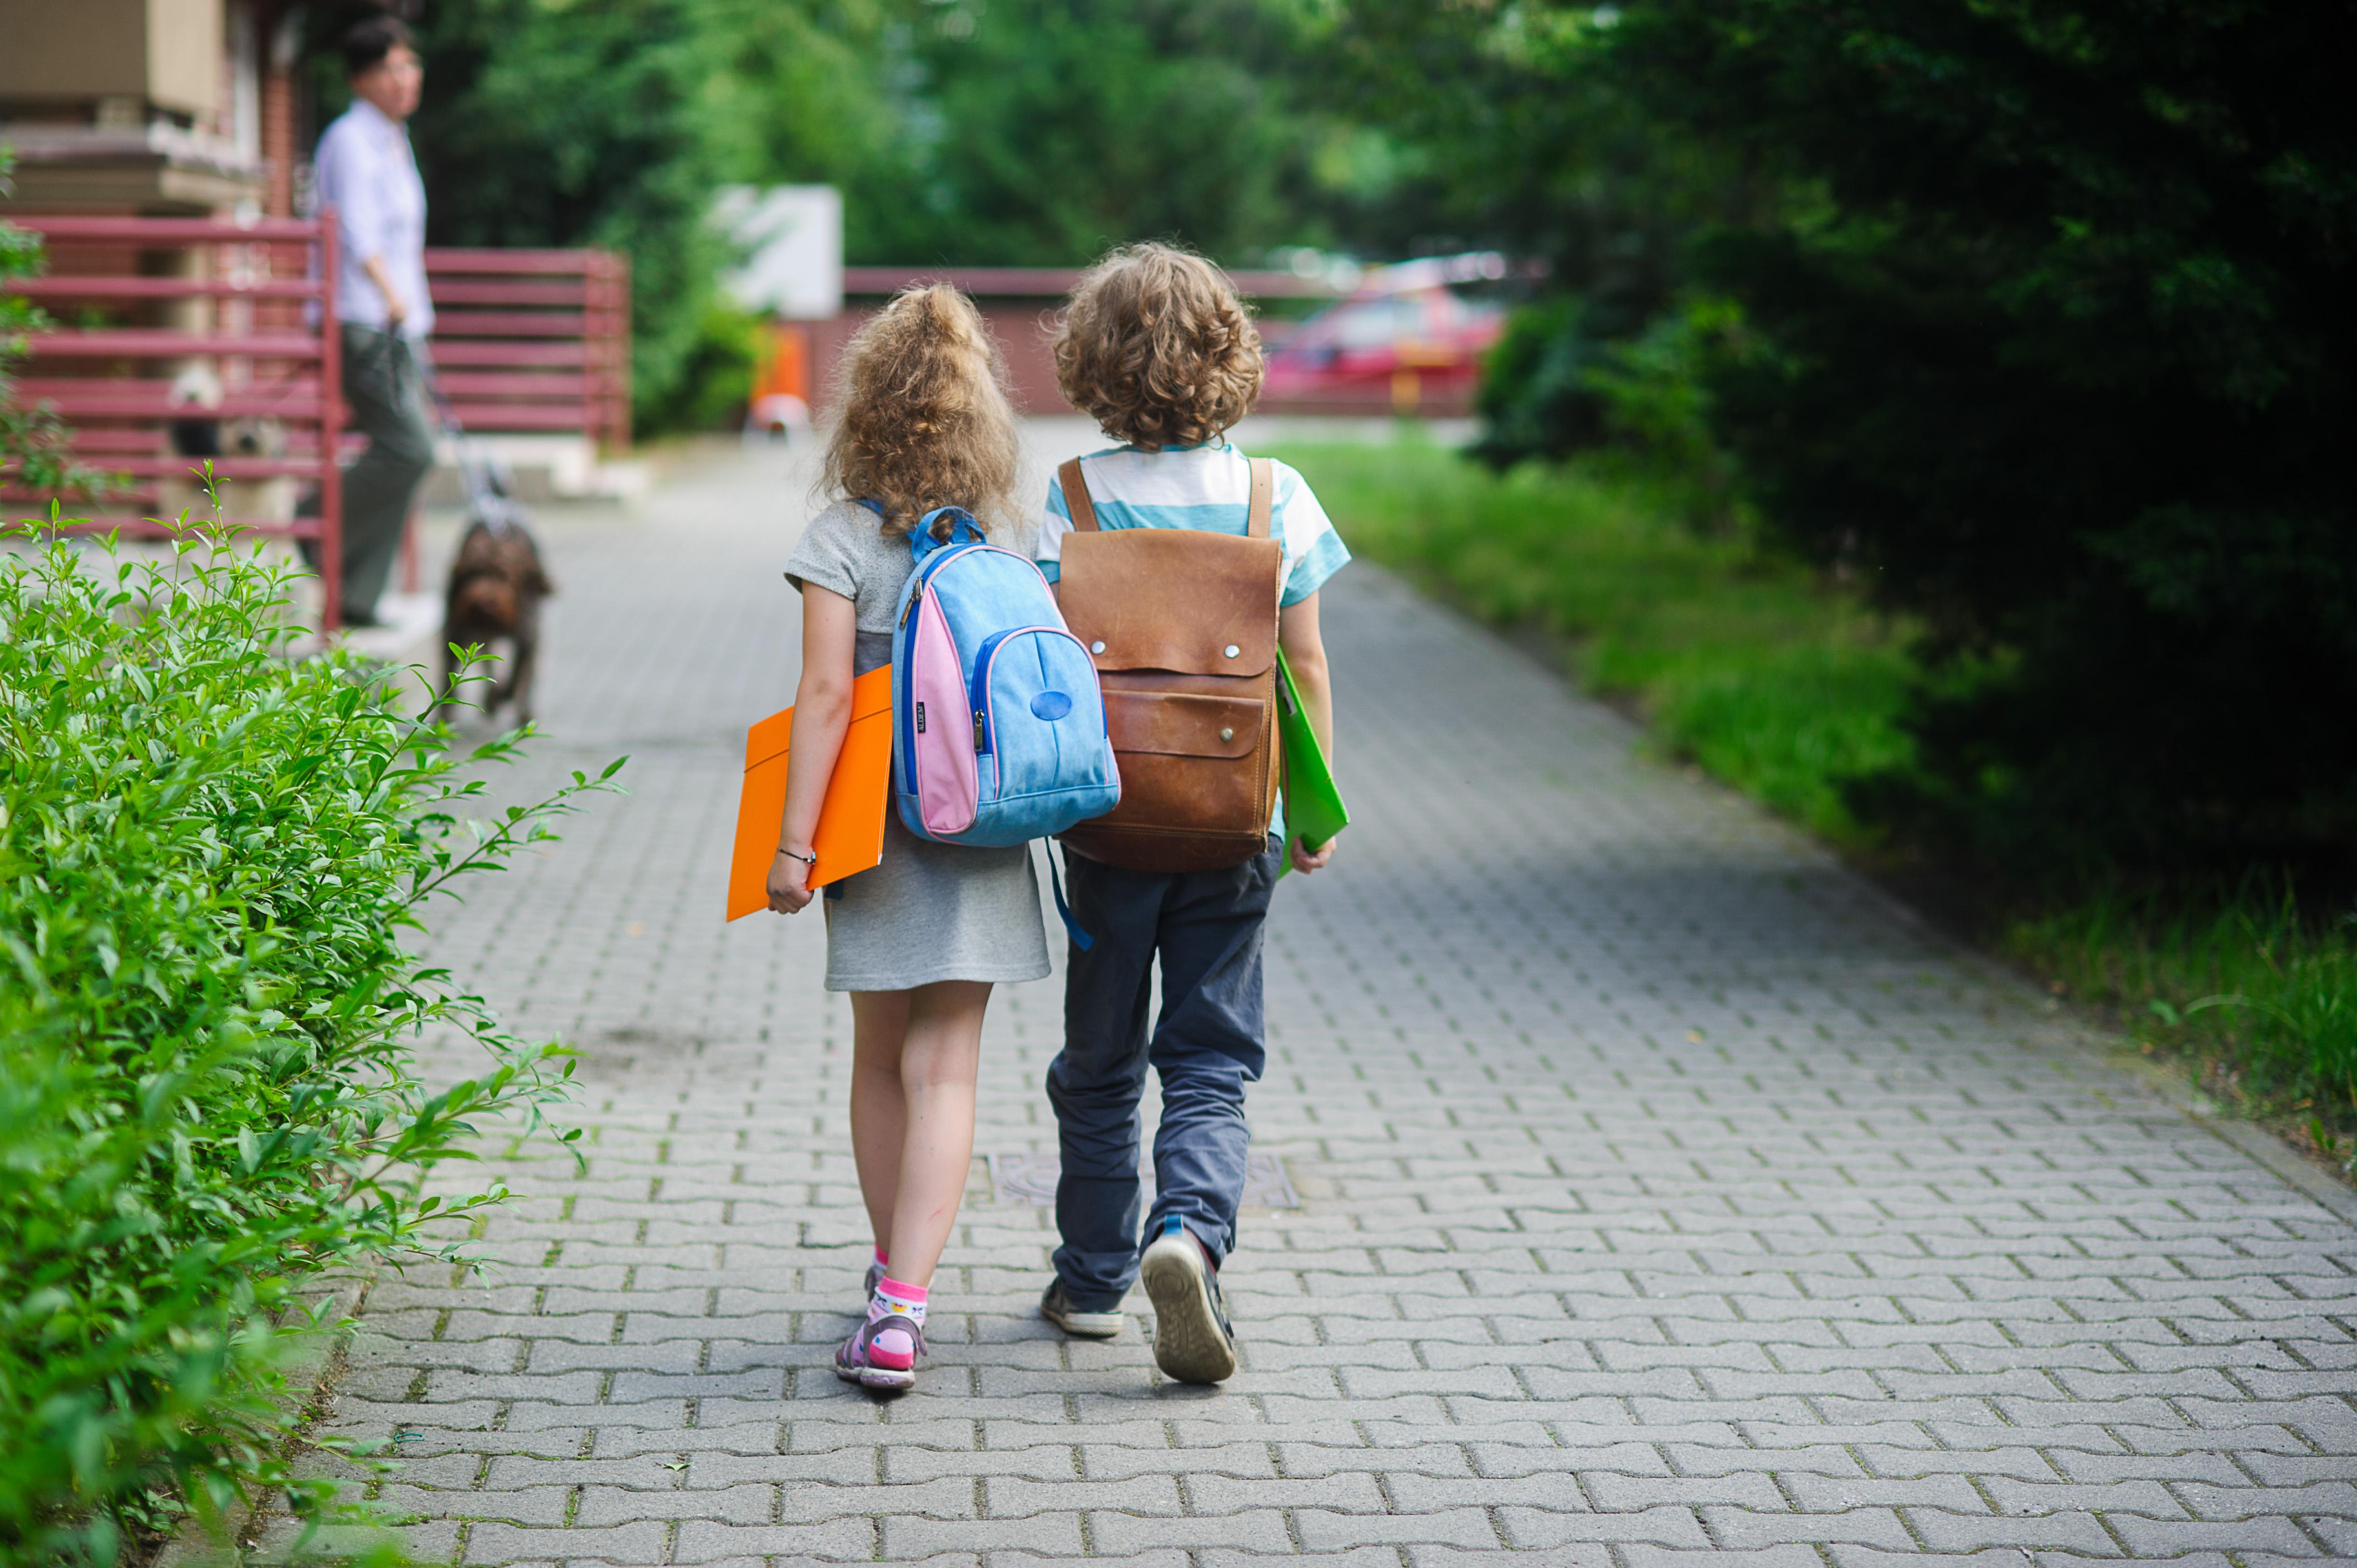 Teacher to Parent—Positive Reinforcement Doesn't Work in the Long Run www.herviewfromhome.com